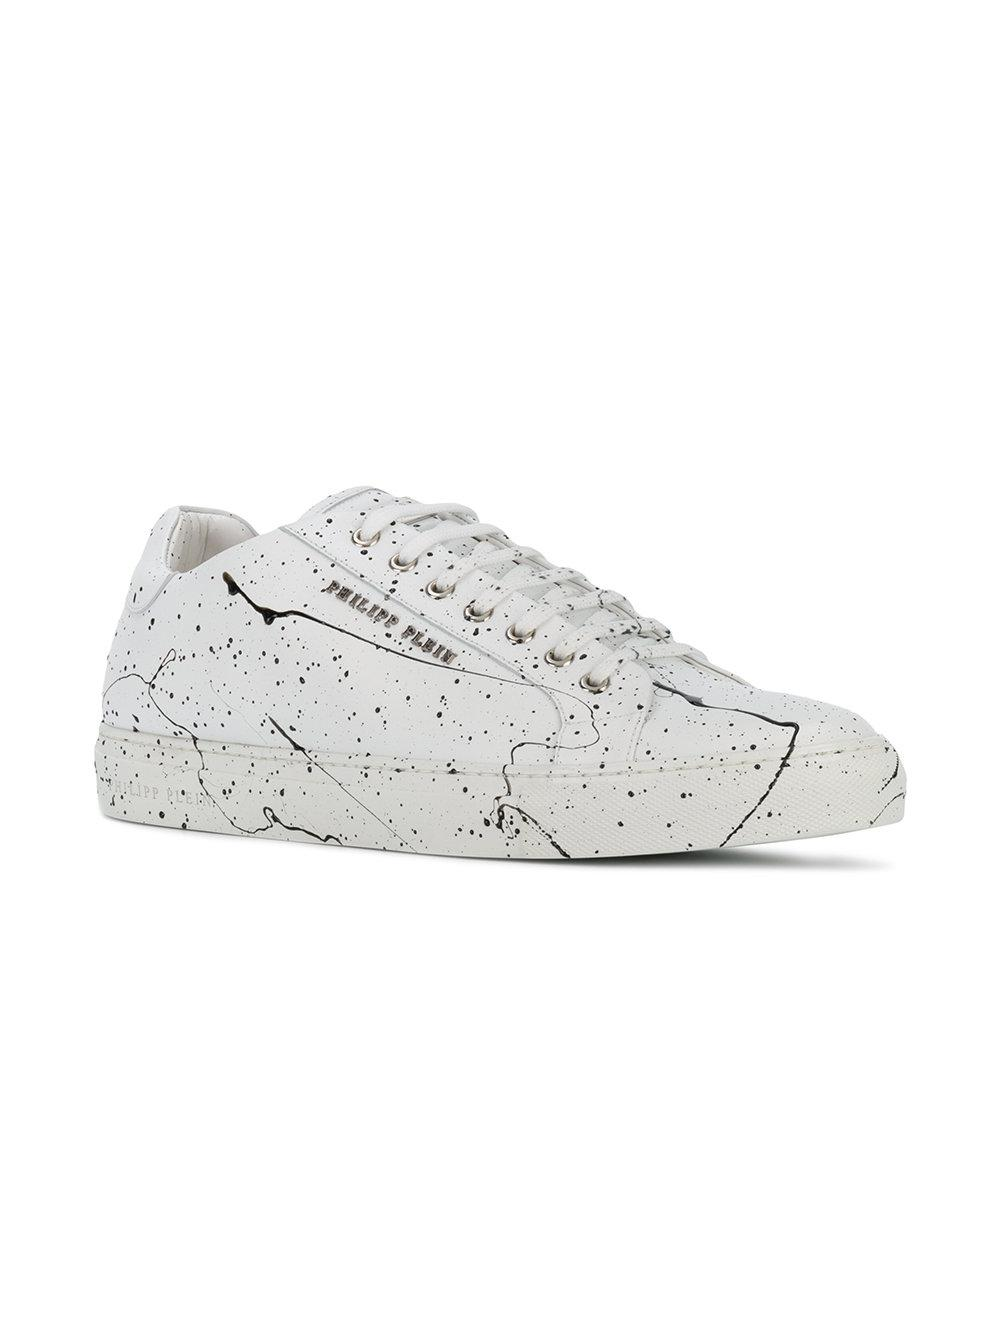 Philipp Plein paint splatter-effect sneakers for sale wholesale price UVpdO9vV